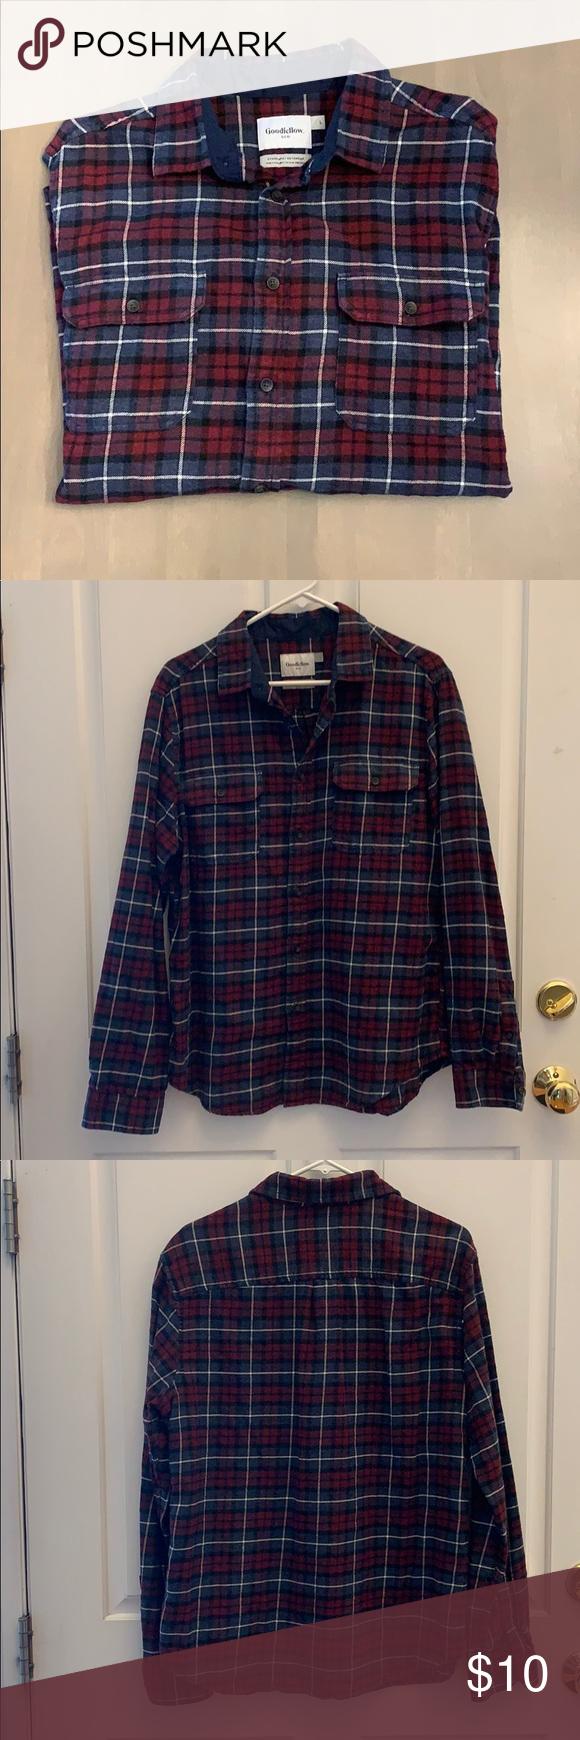 Goodfellow & Co Men's Flannel Shirt, Button Down L